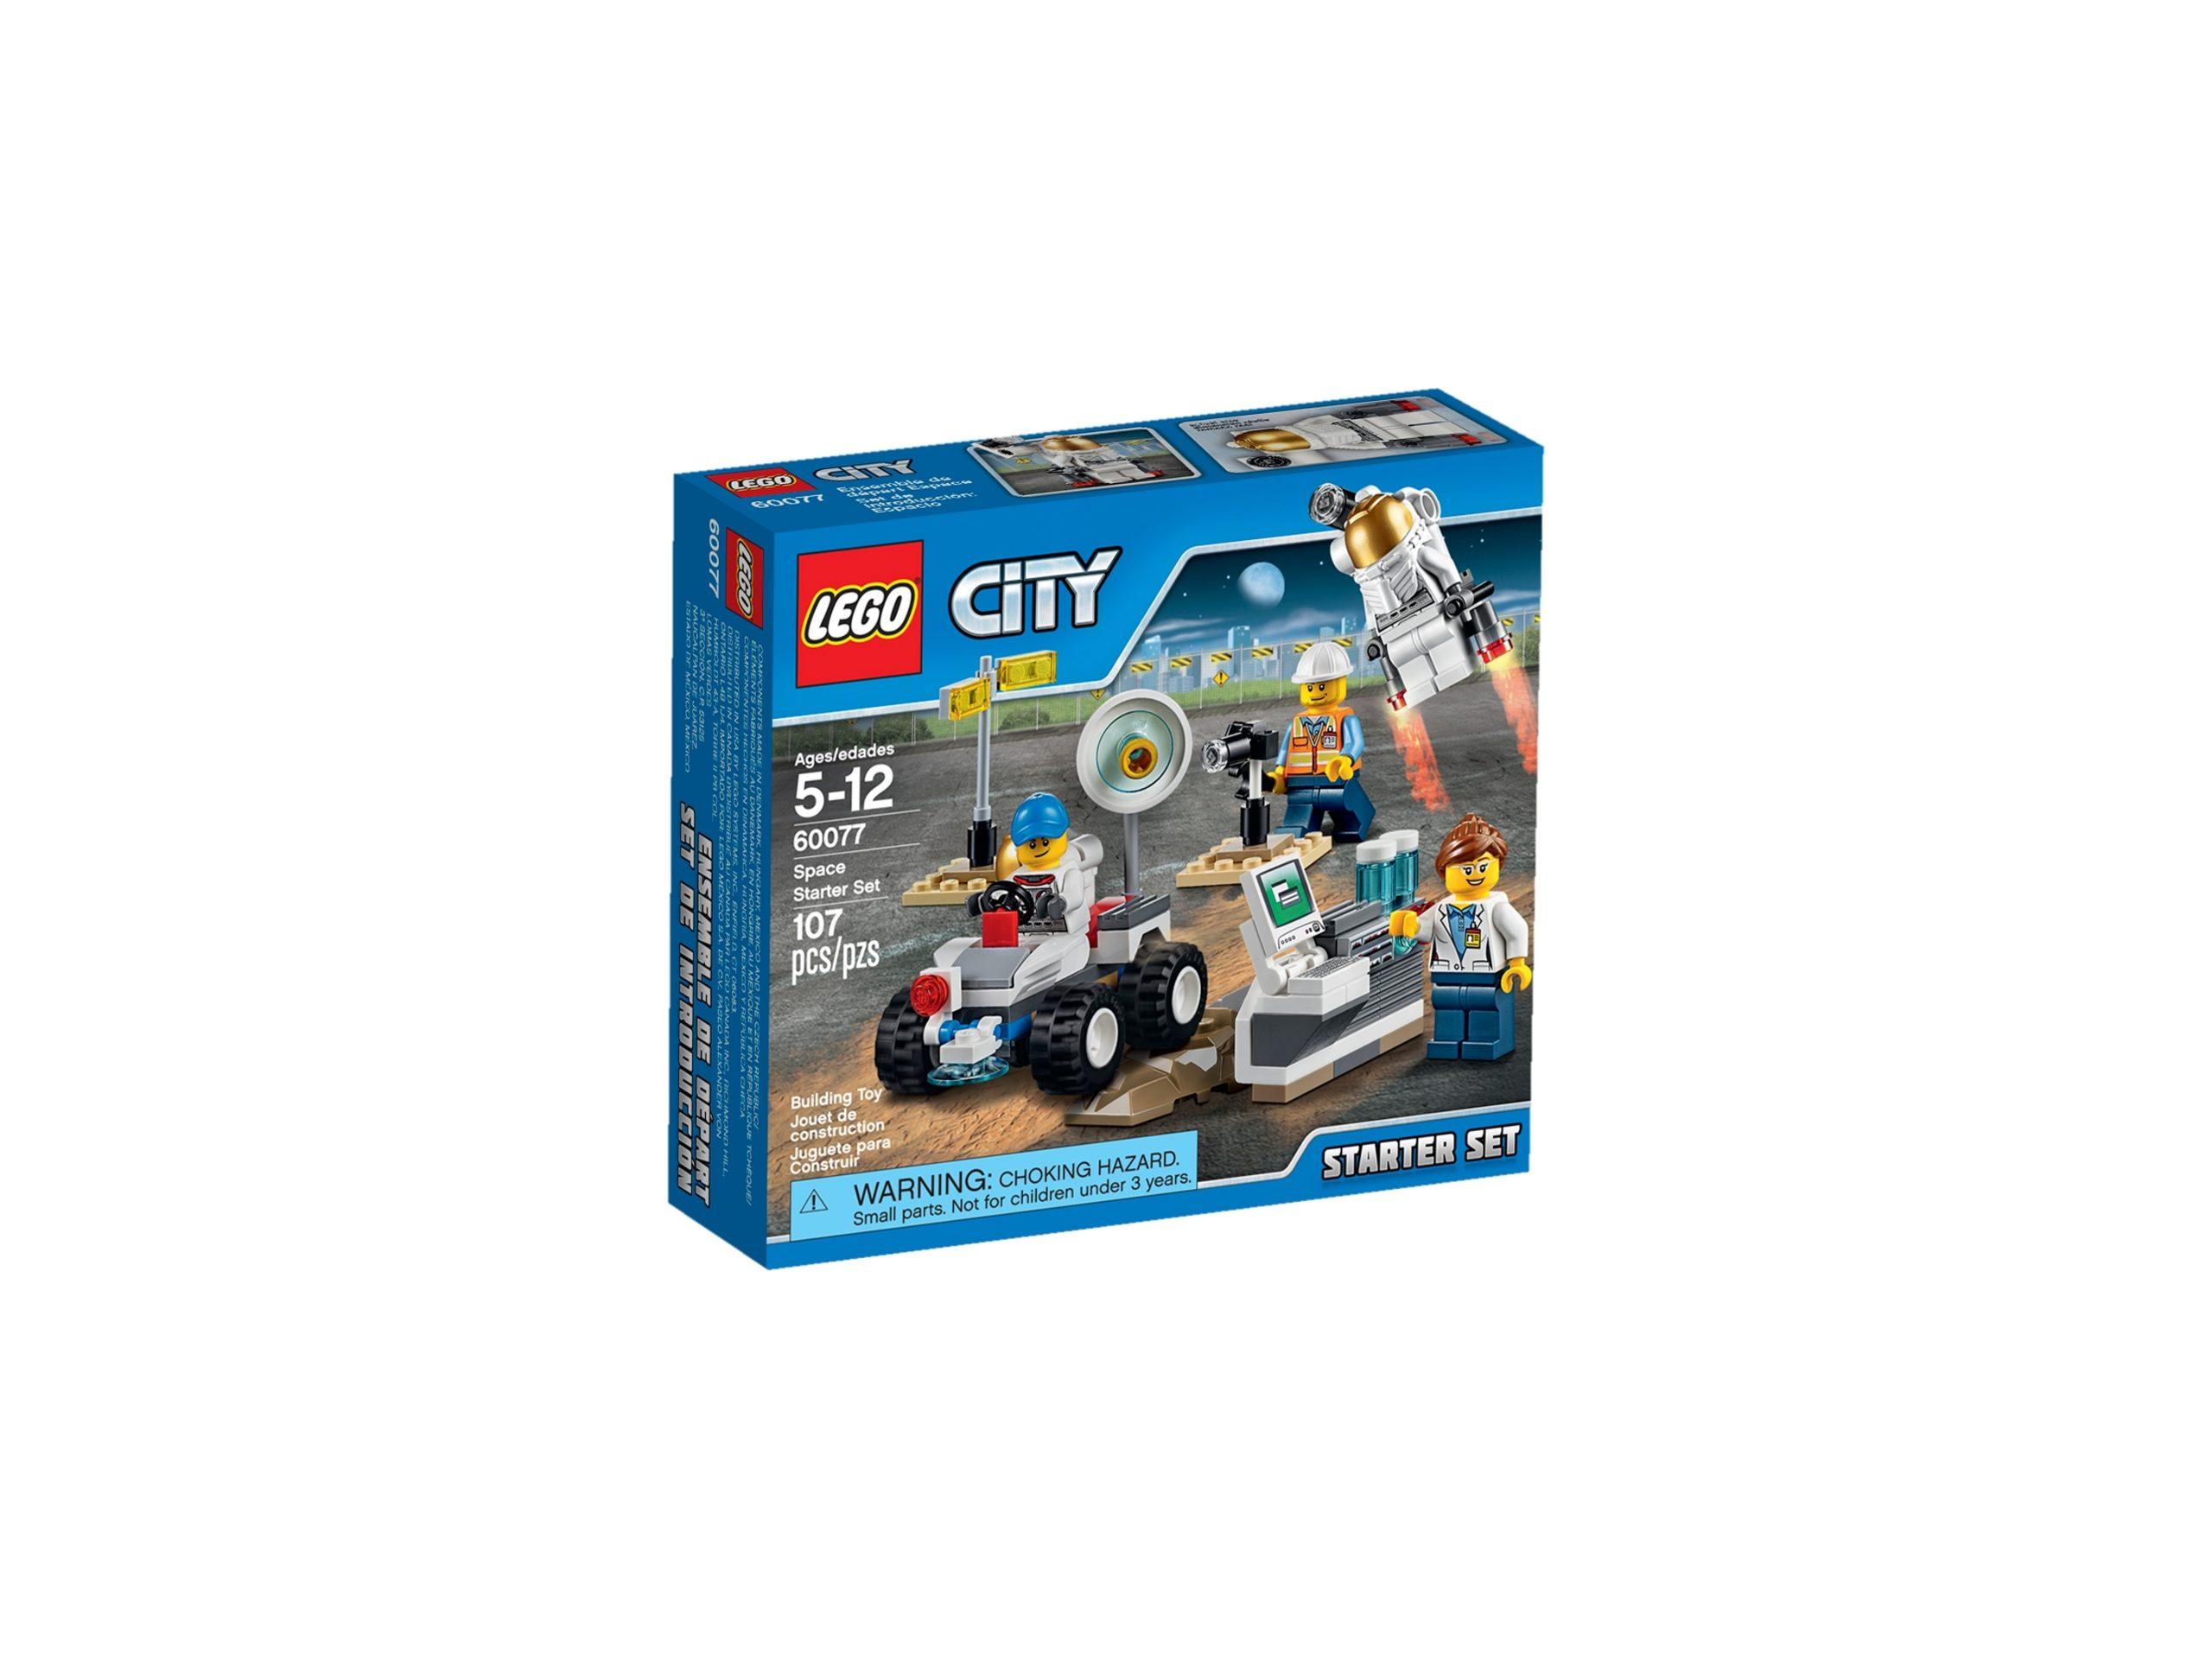 lego 60077 space starter set scaled